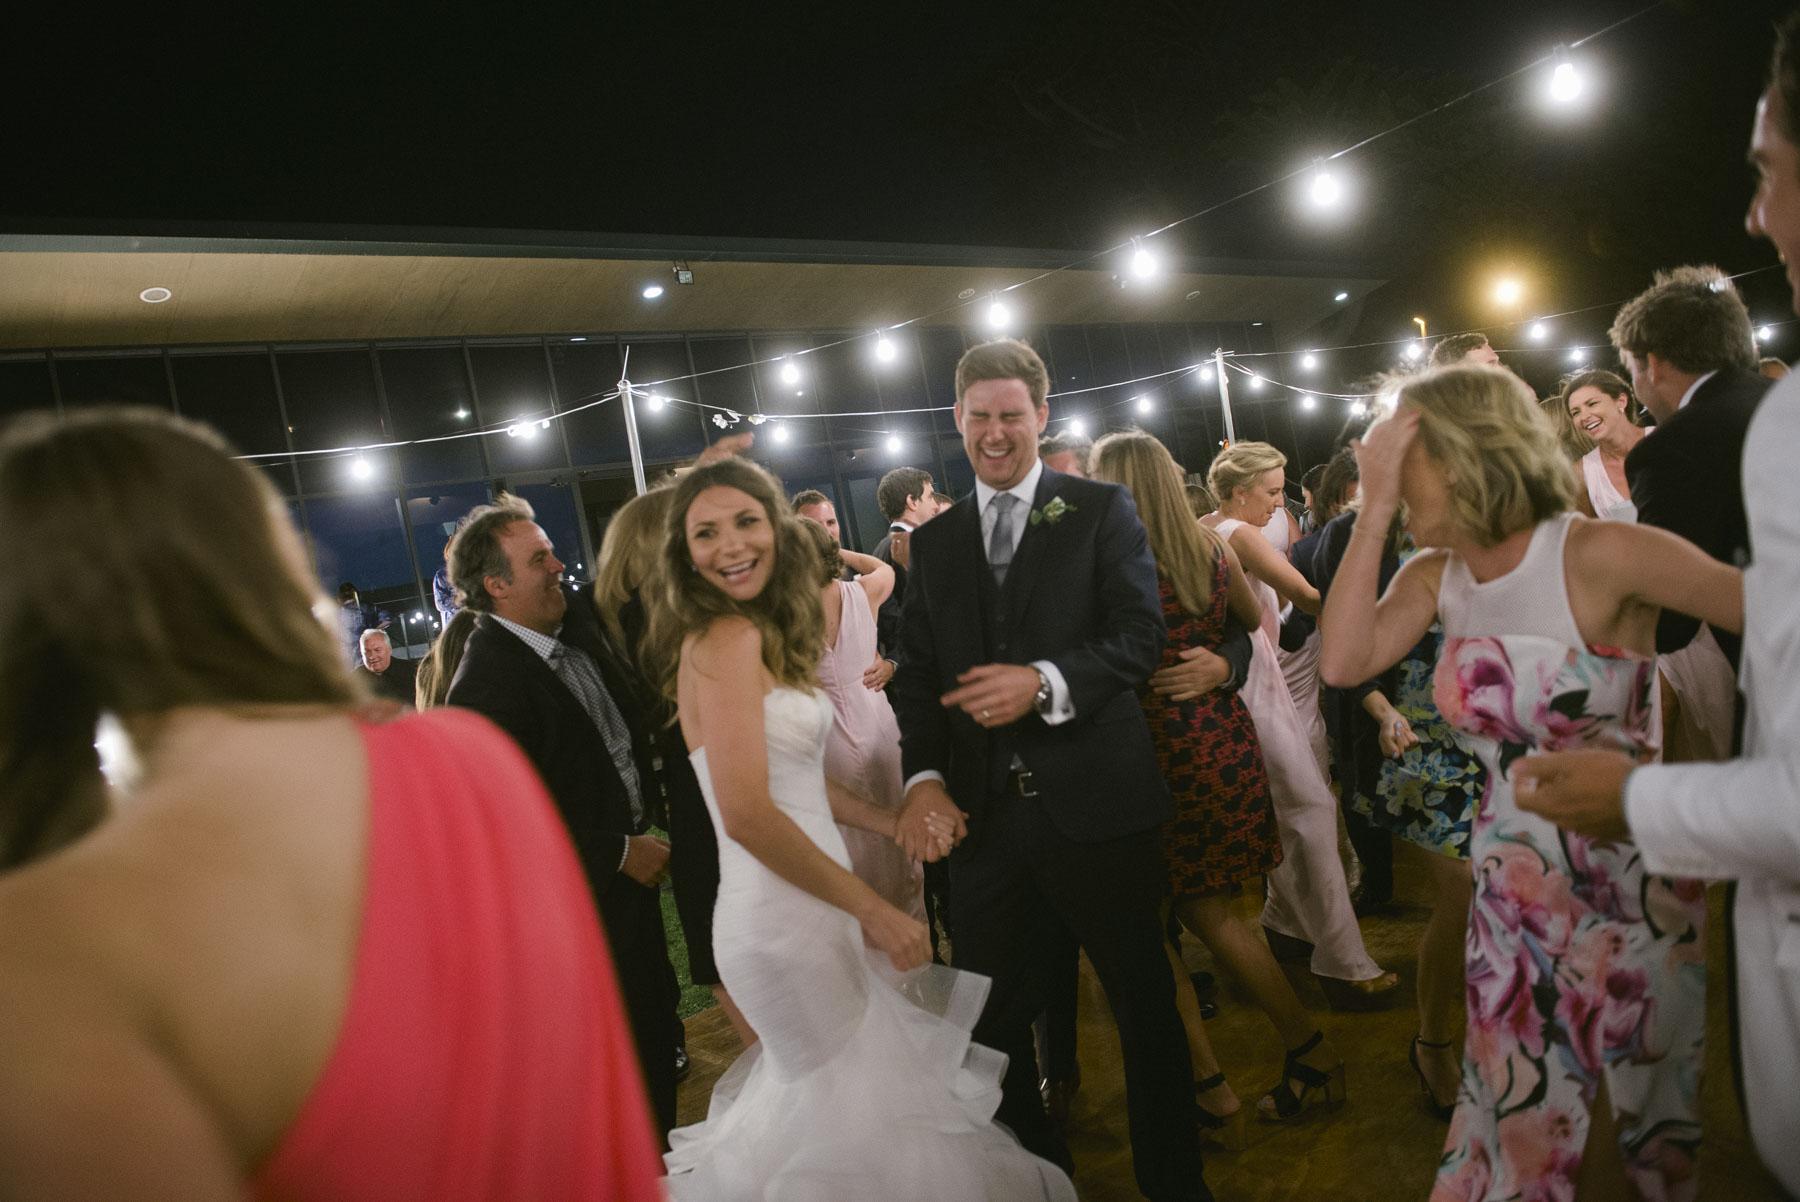 1501vand-447alan_moyle_wedding_portrait_brighton_bayside_werribee_estate_mansion_zoo_rustic_styled_garden_mansion_candid_documentry_victoria_whitelaw.jpg